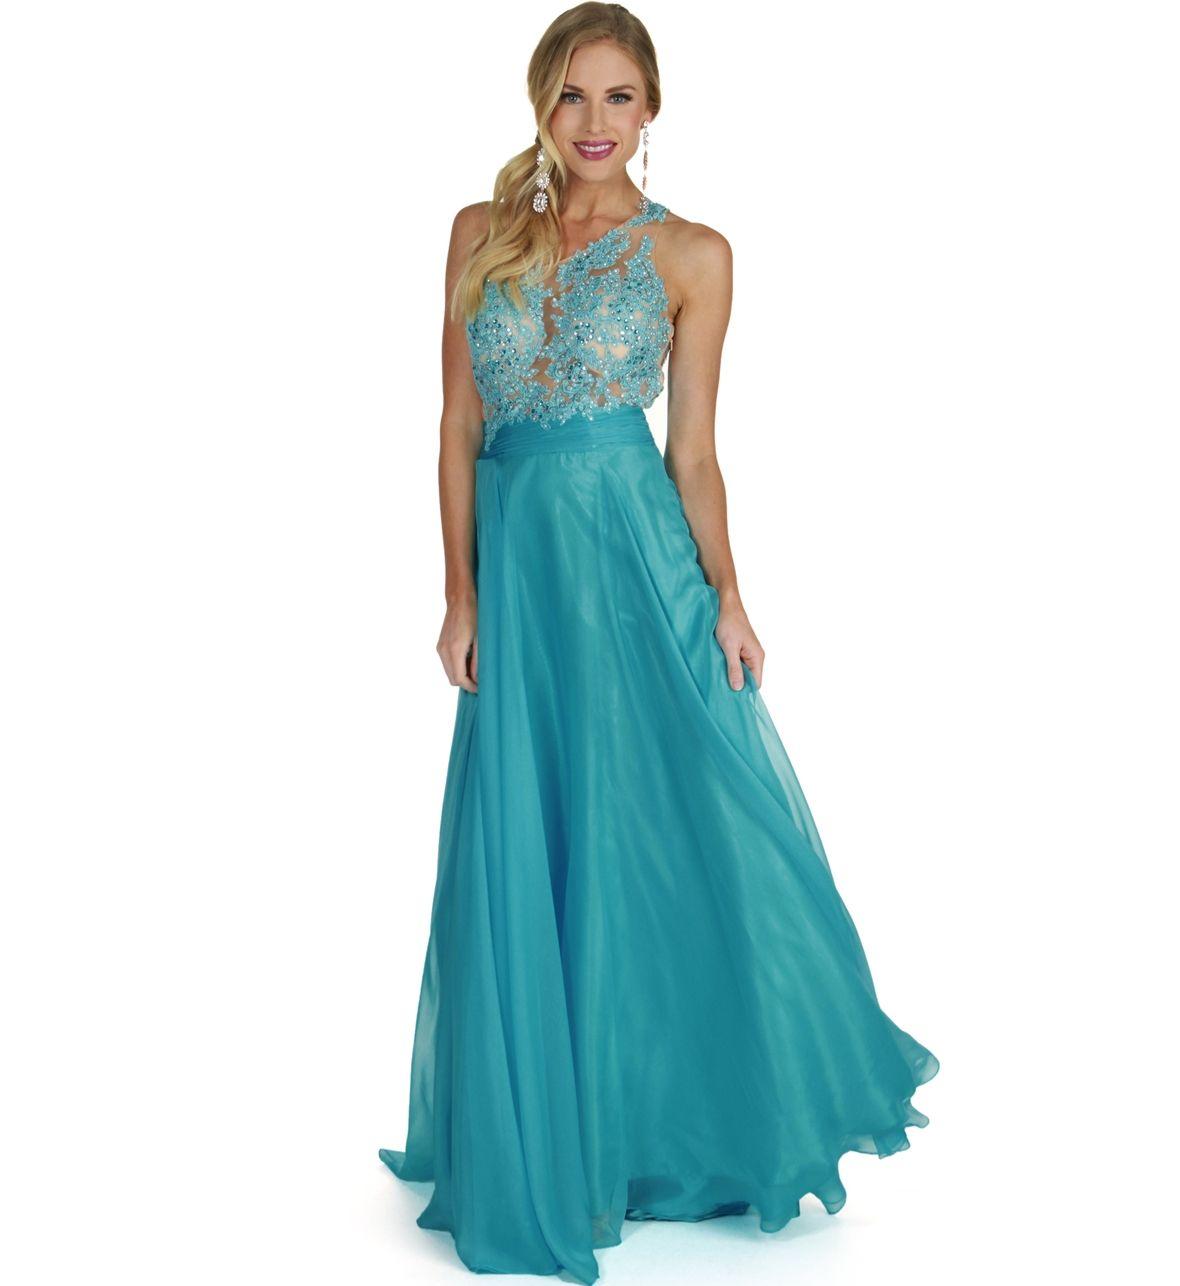 Viviana lt blue prom dress prom pinterest prom